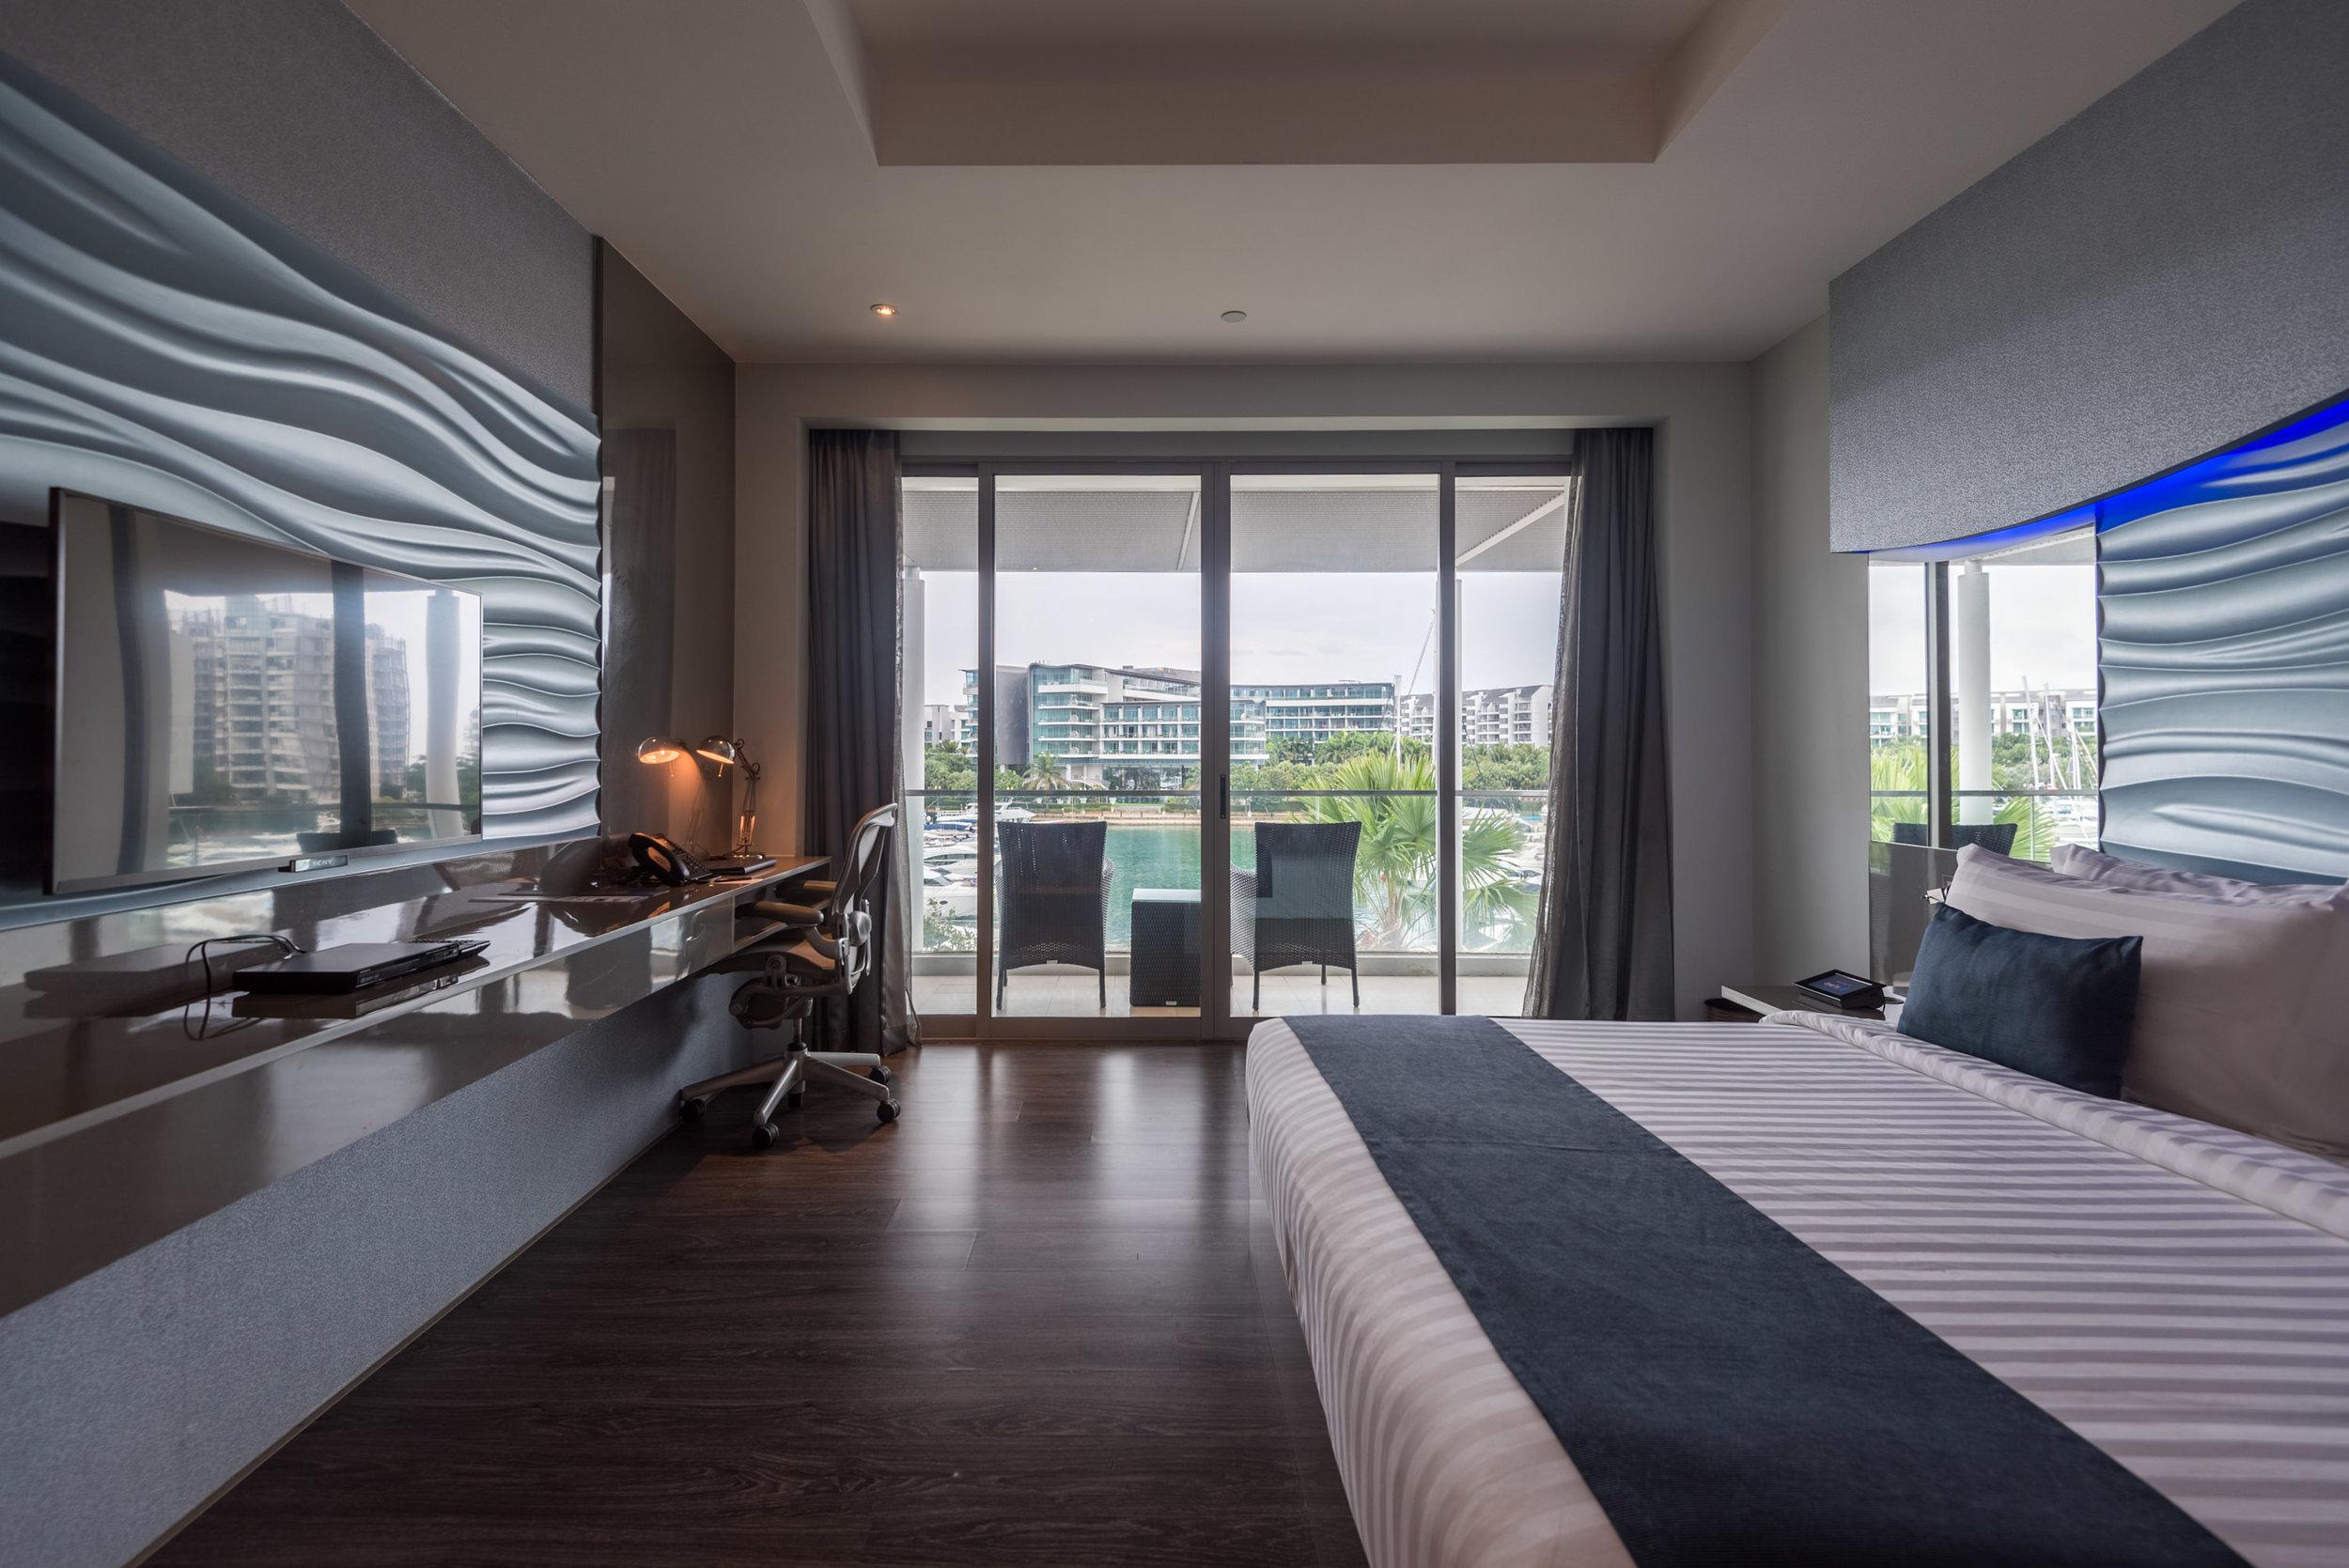 Bedroom with View of Marina  Marina View Room - ONE°15 Marina Club